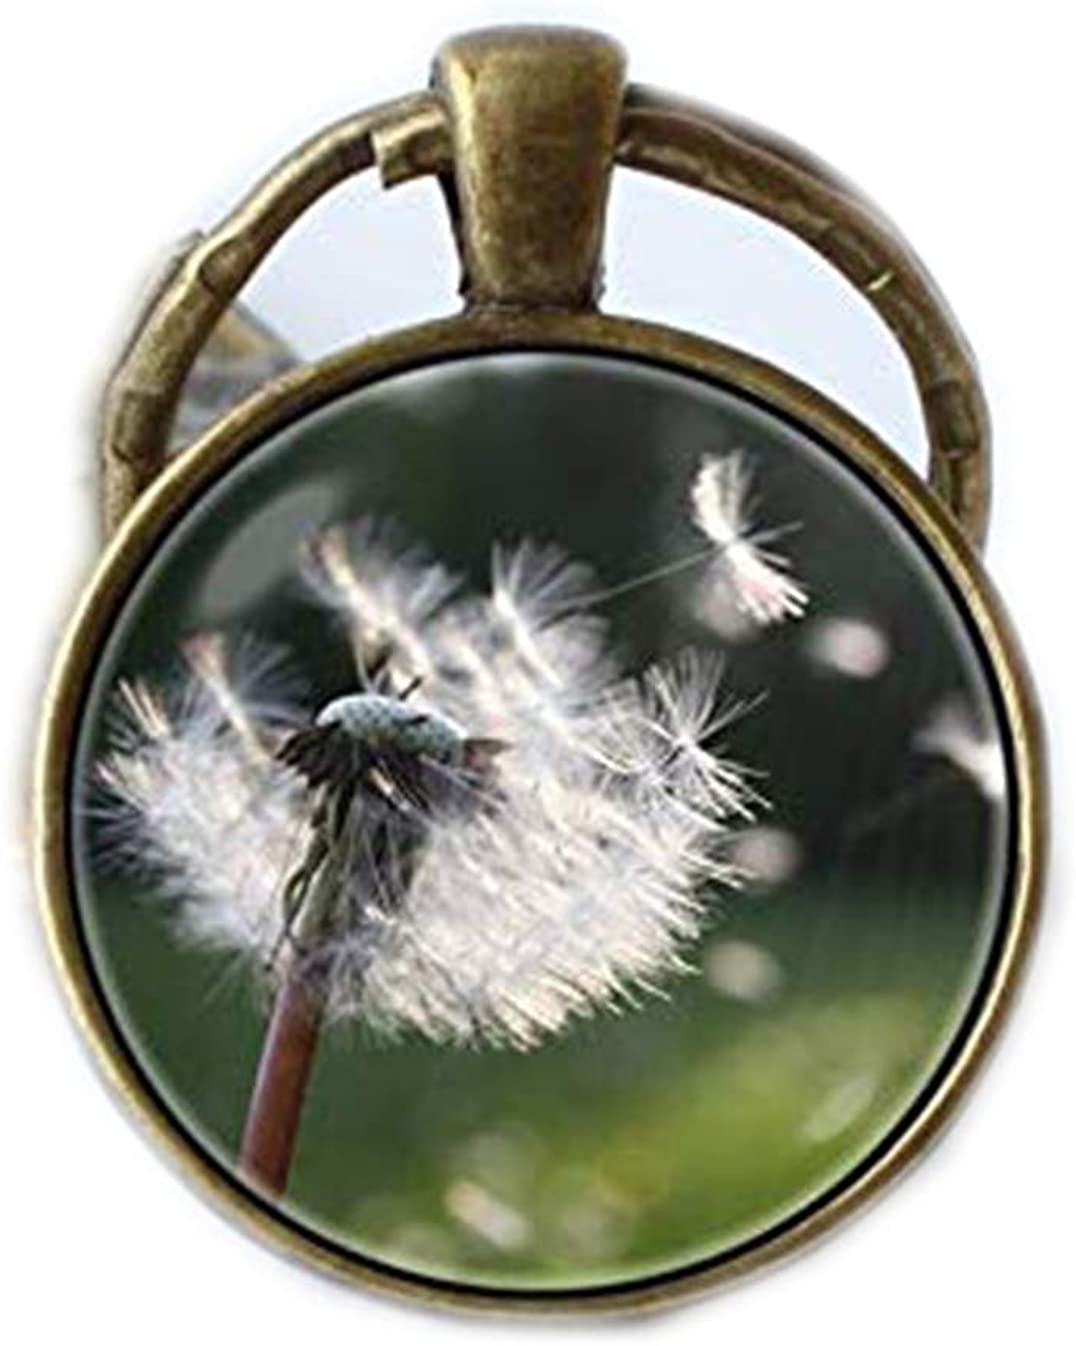 Art Picture Key Chains,Botanical keyring Dandelion seeds Keychain Dandelion jewelry Dandelion key fob Flower jewelry Flower keyring Plants key chain Wish key ring,Gift of love